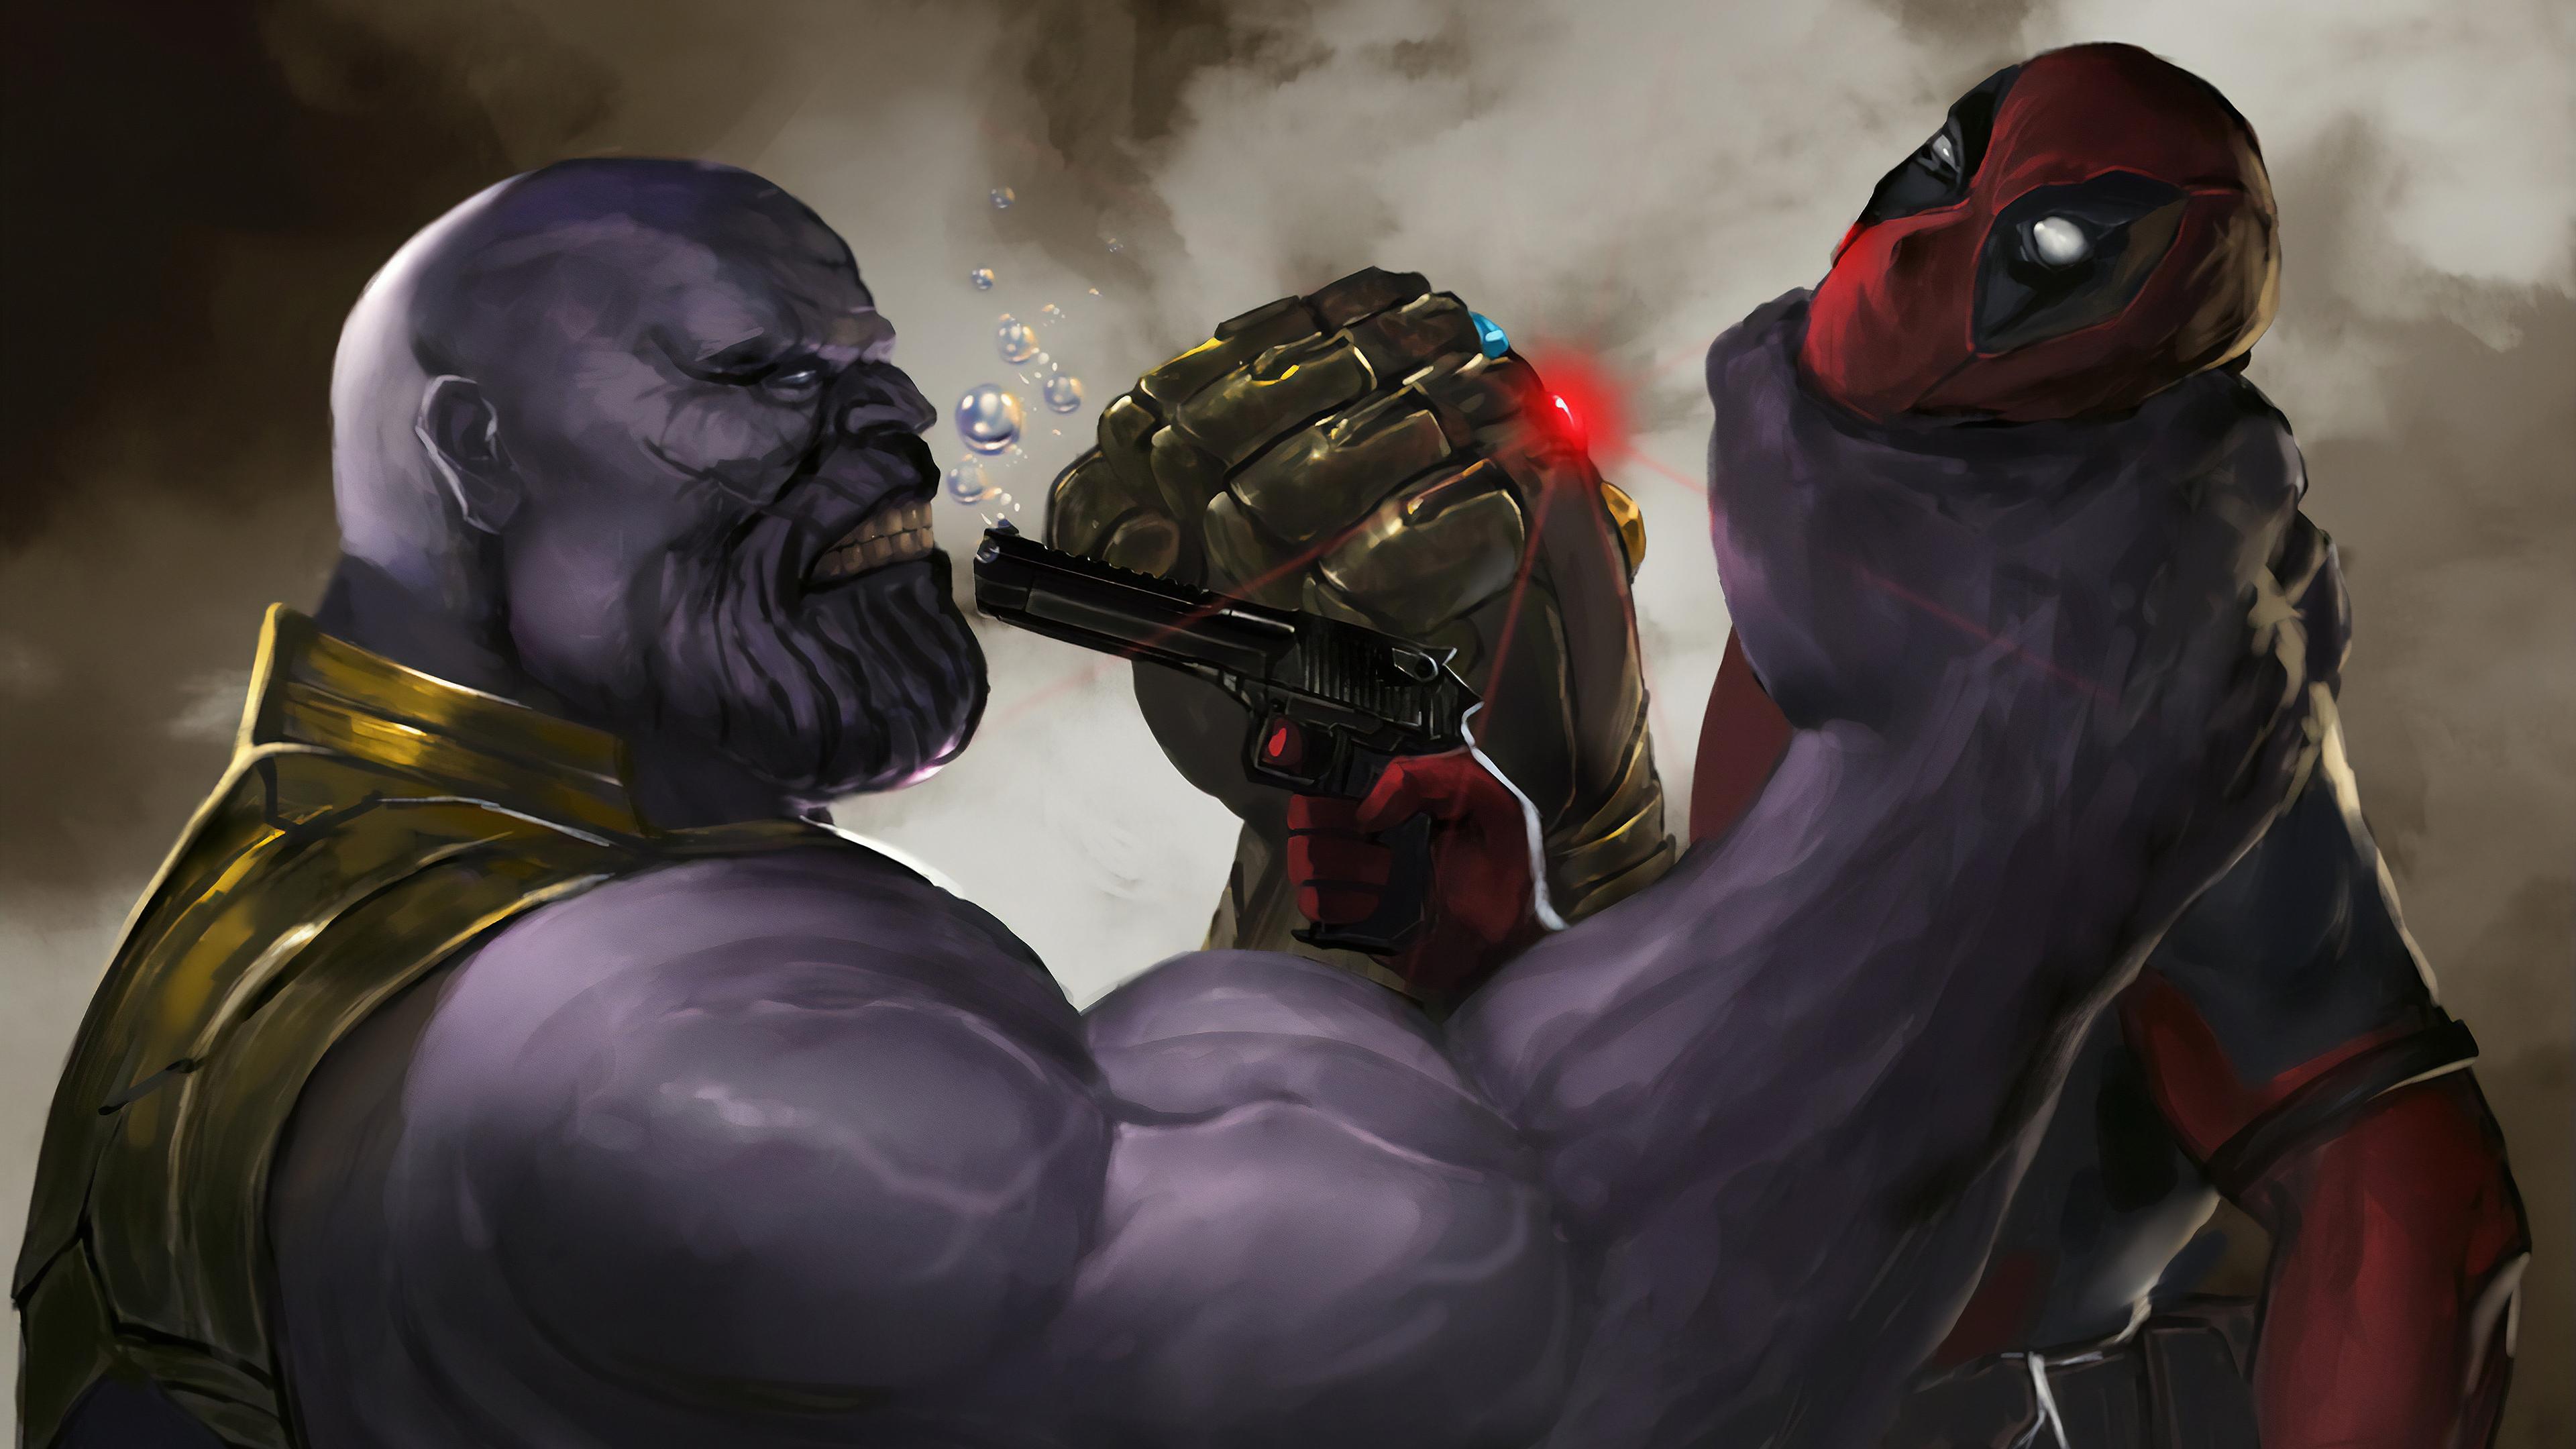 Deadpool 4k Wallpaper Vs Thanos Deadpool Thanos Wallpaper 4k 3840x2160 Download Hd Wallpaper Wallpapertip